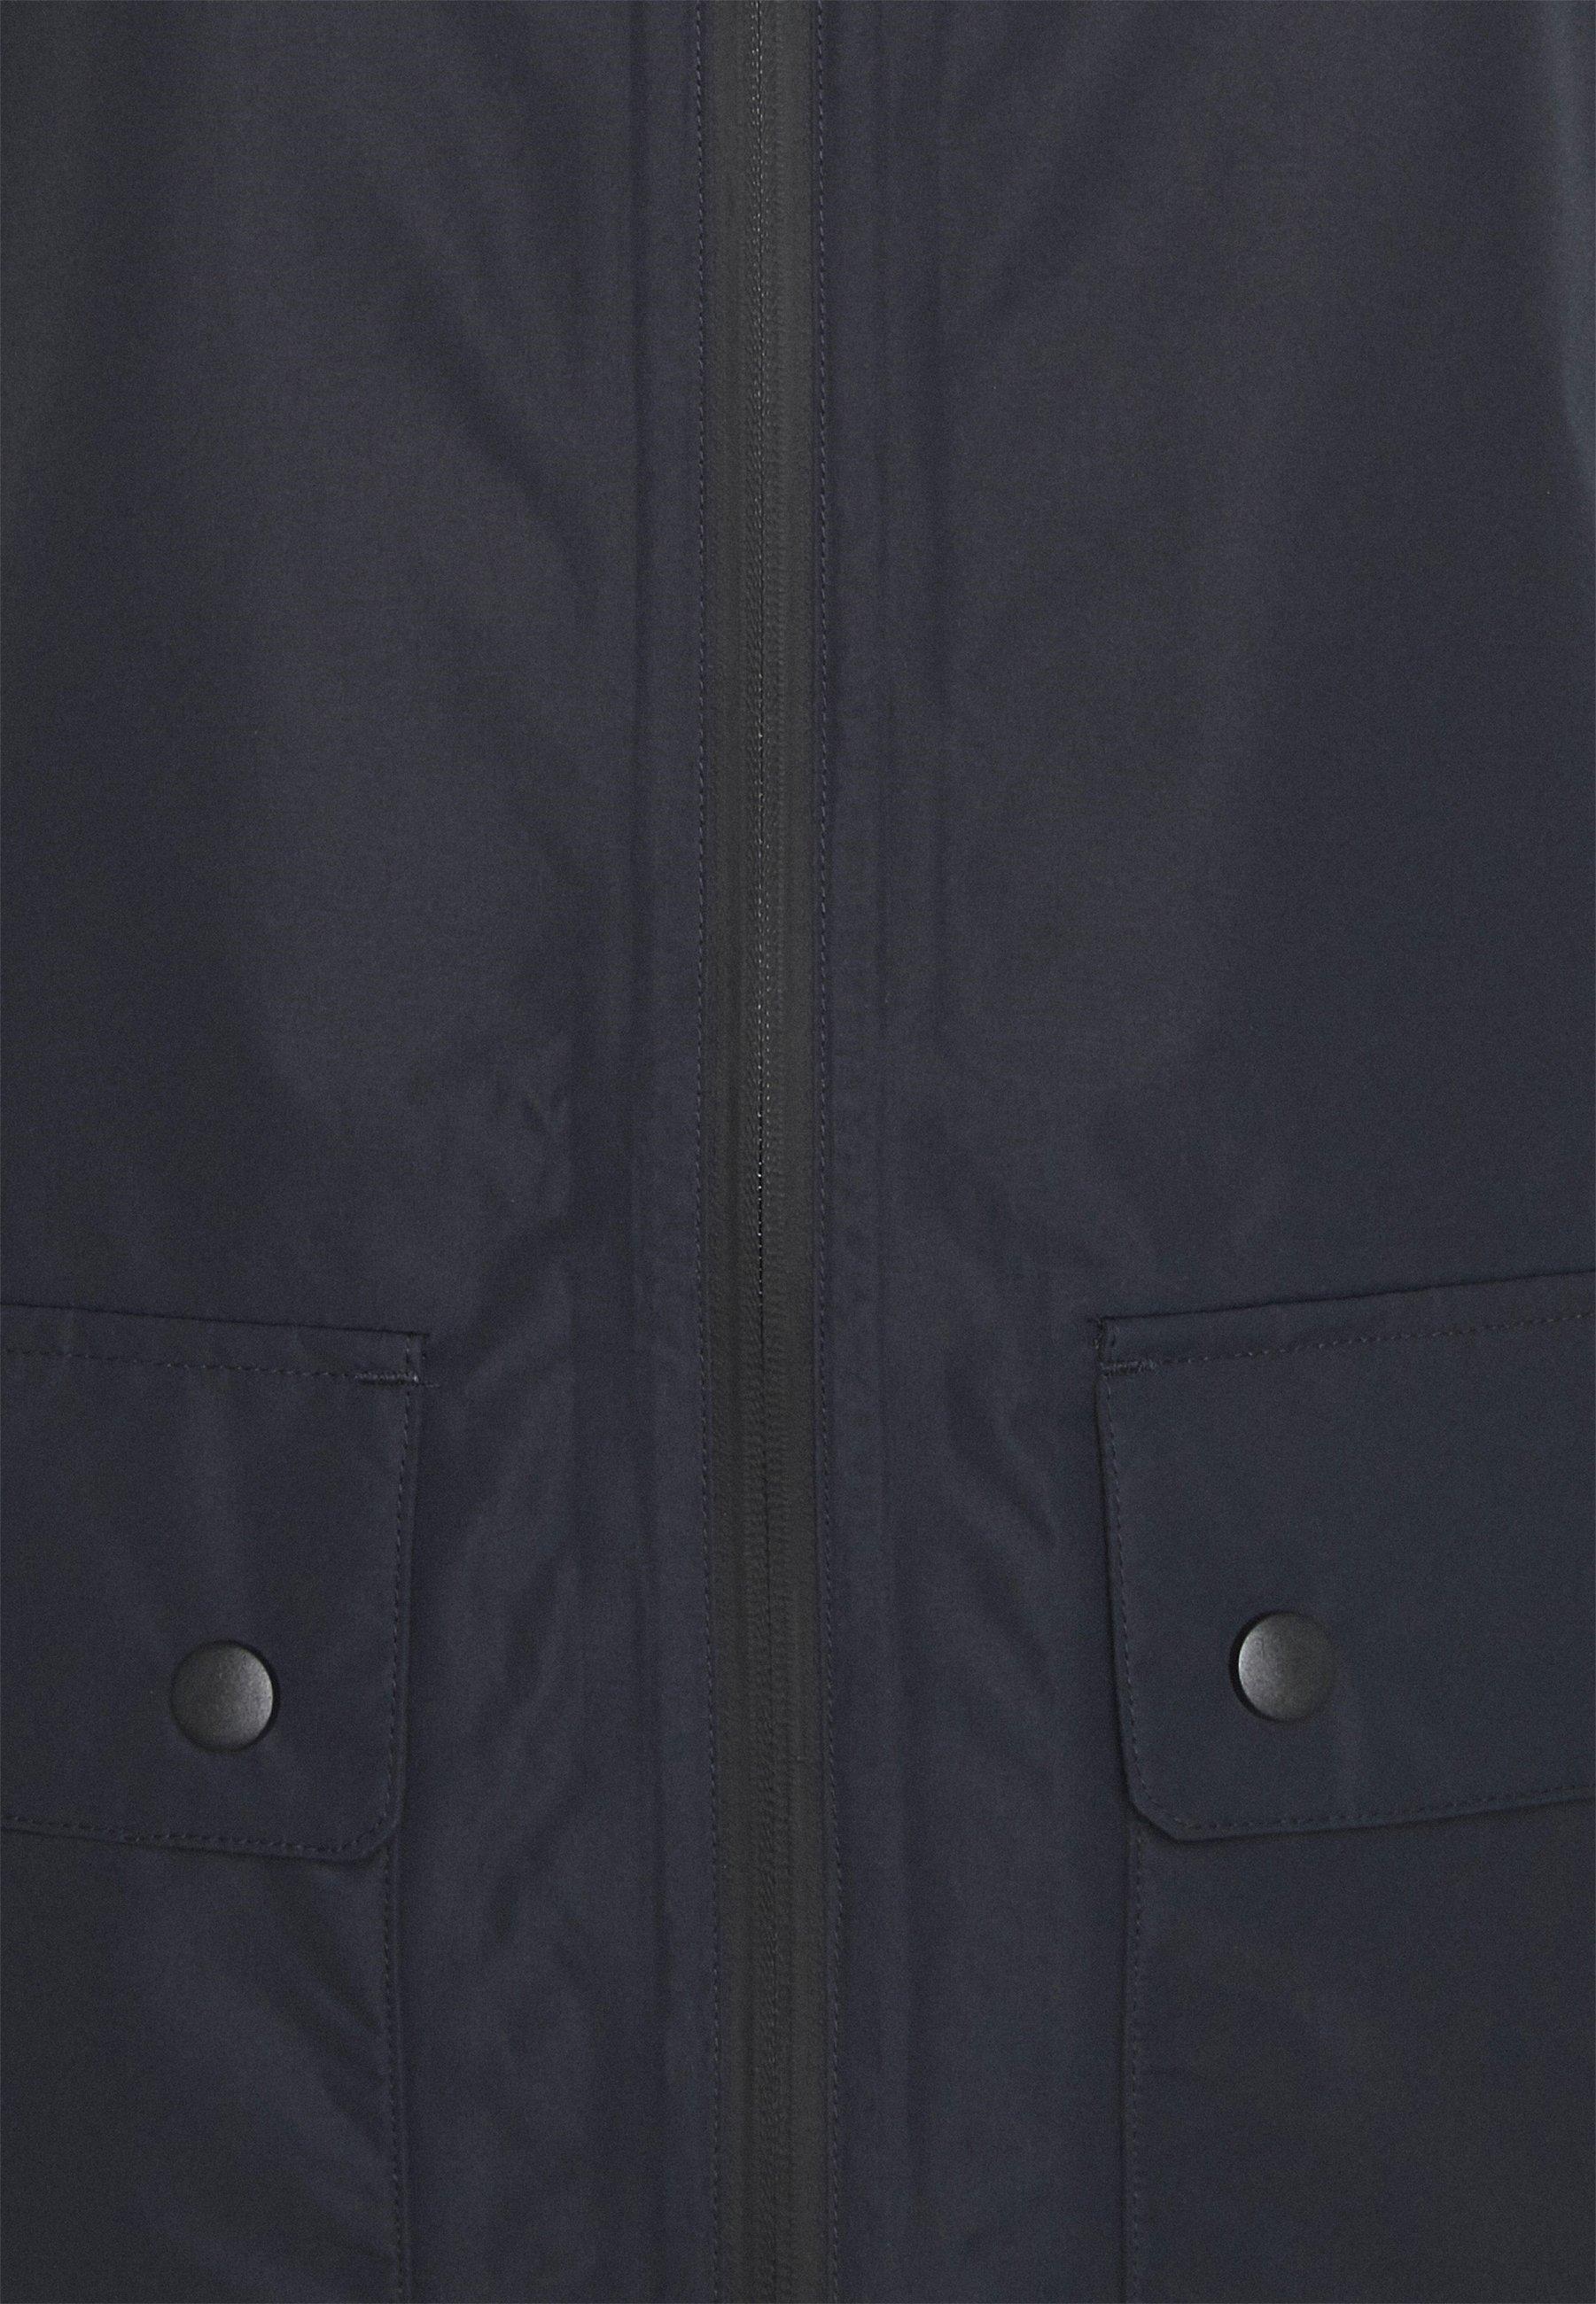 Damen NIAGARA - Regenjacke / wasserabweisende Jacke